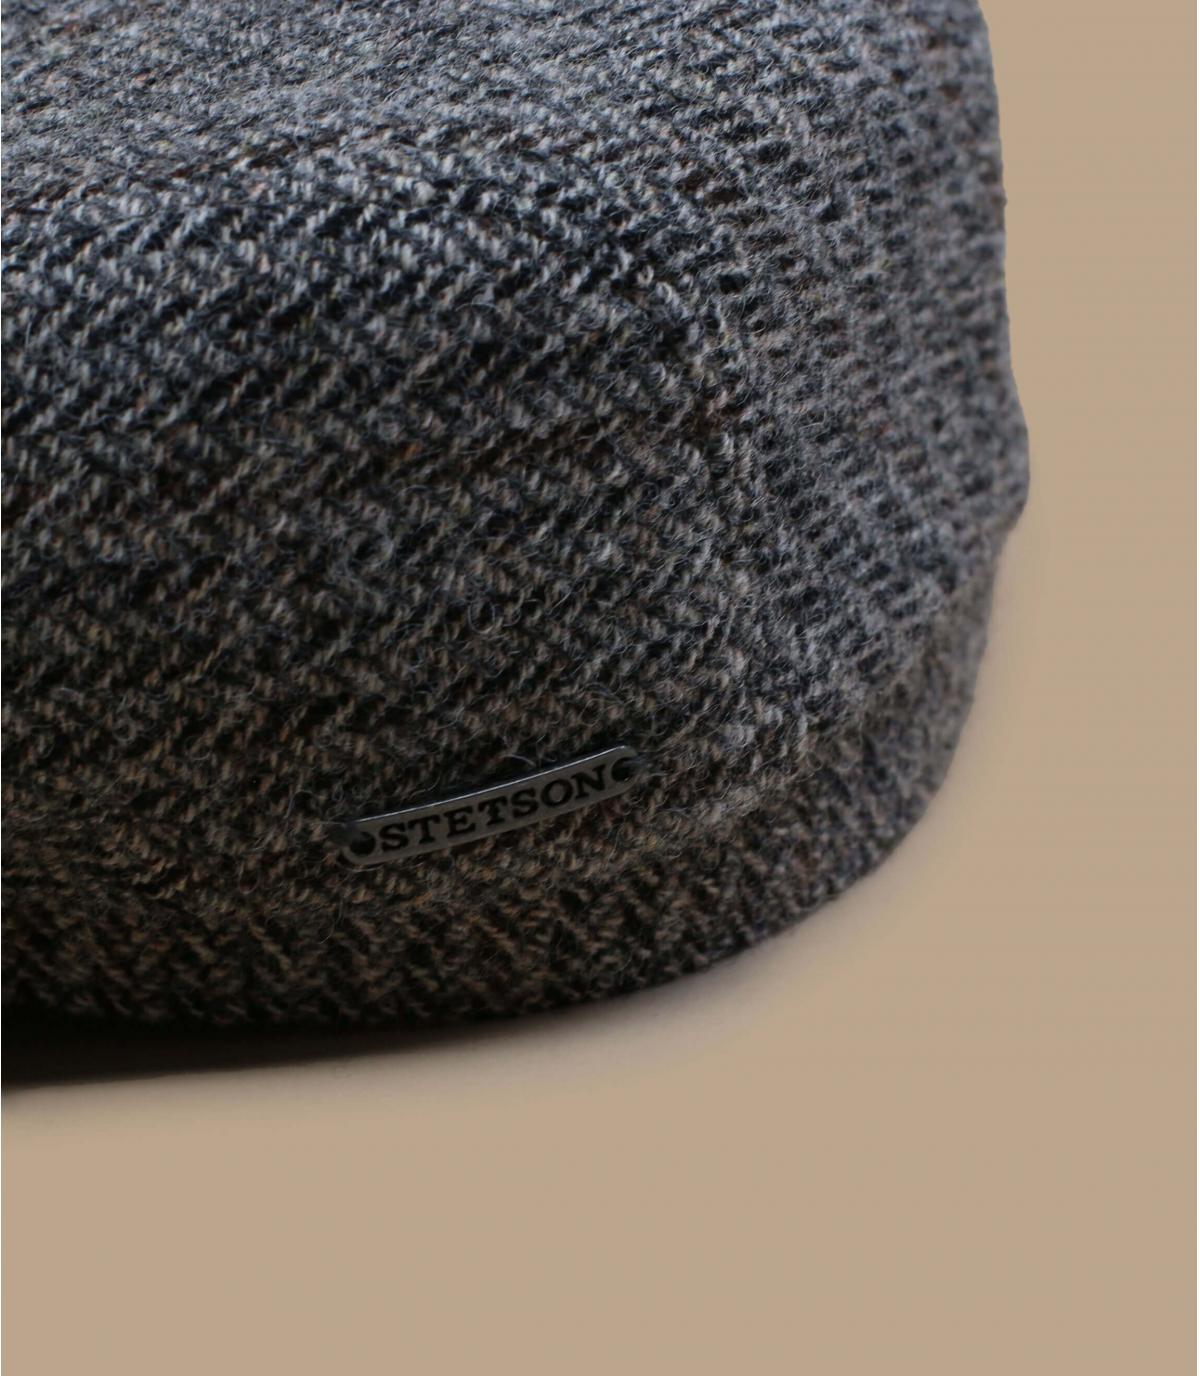 Dettagli Driver Cap Virgin Wool Herringbone grey - image 2